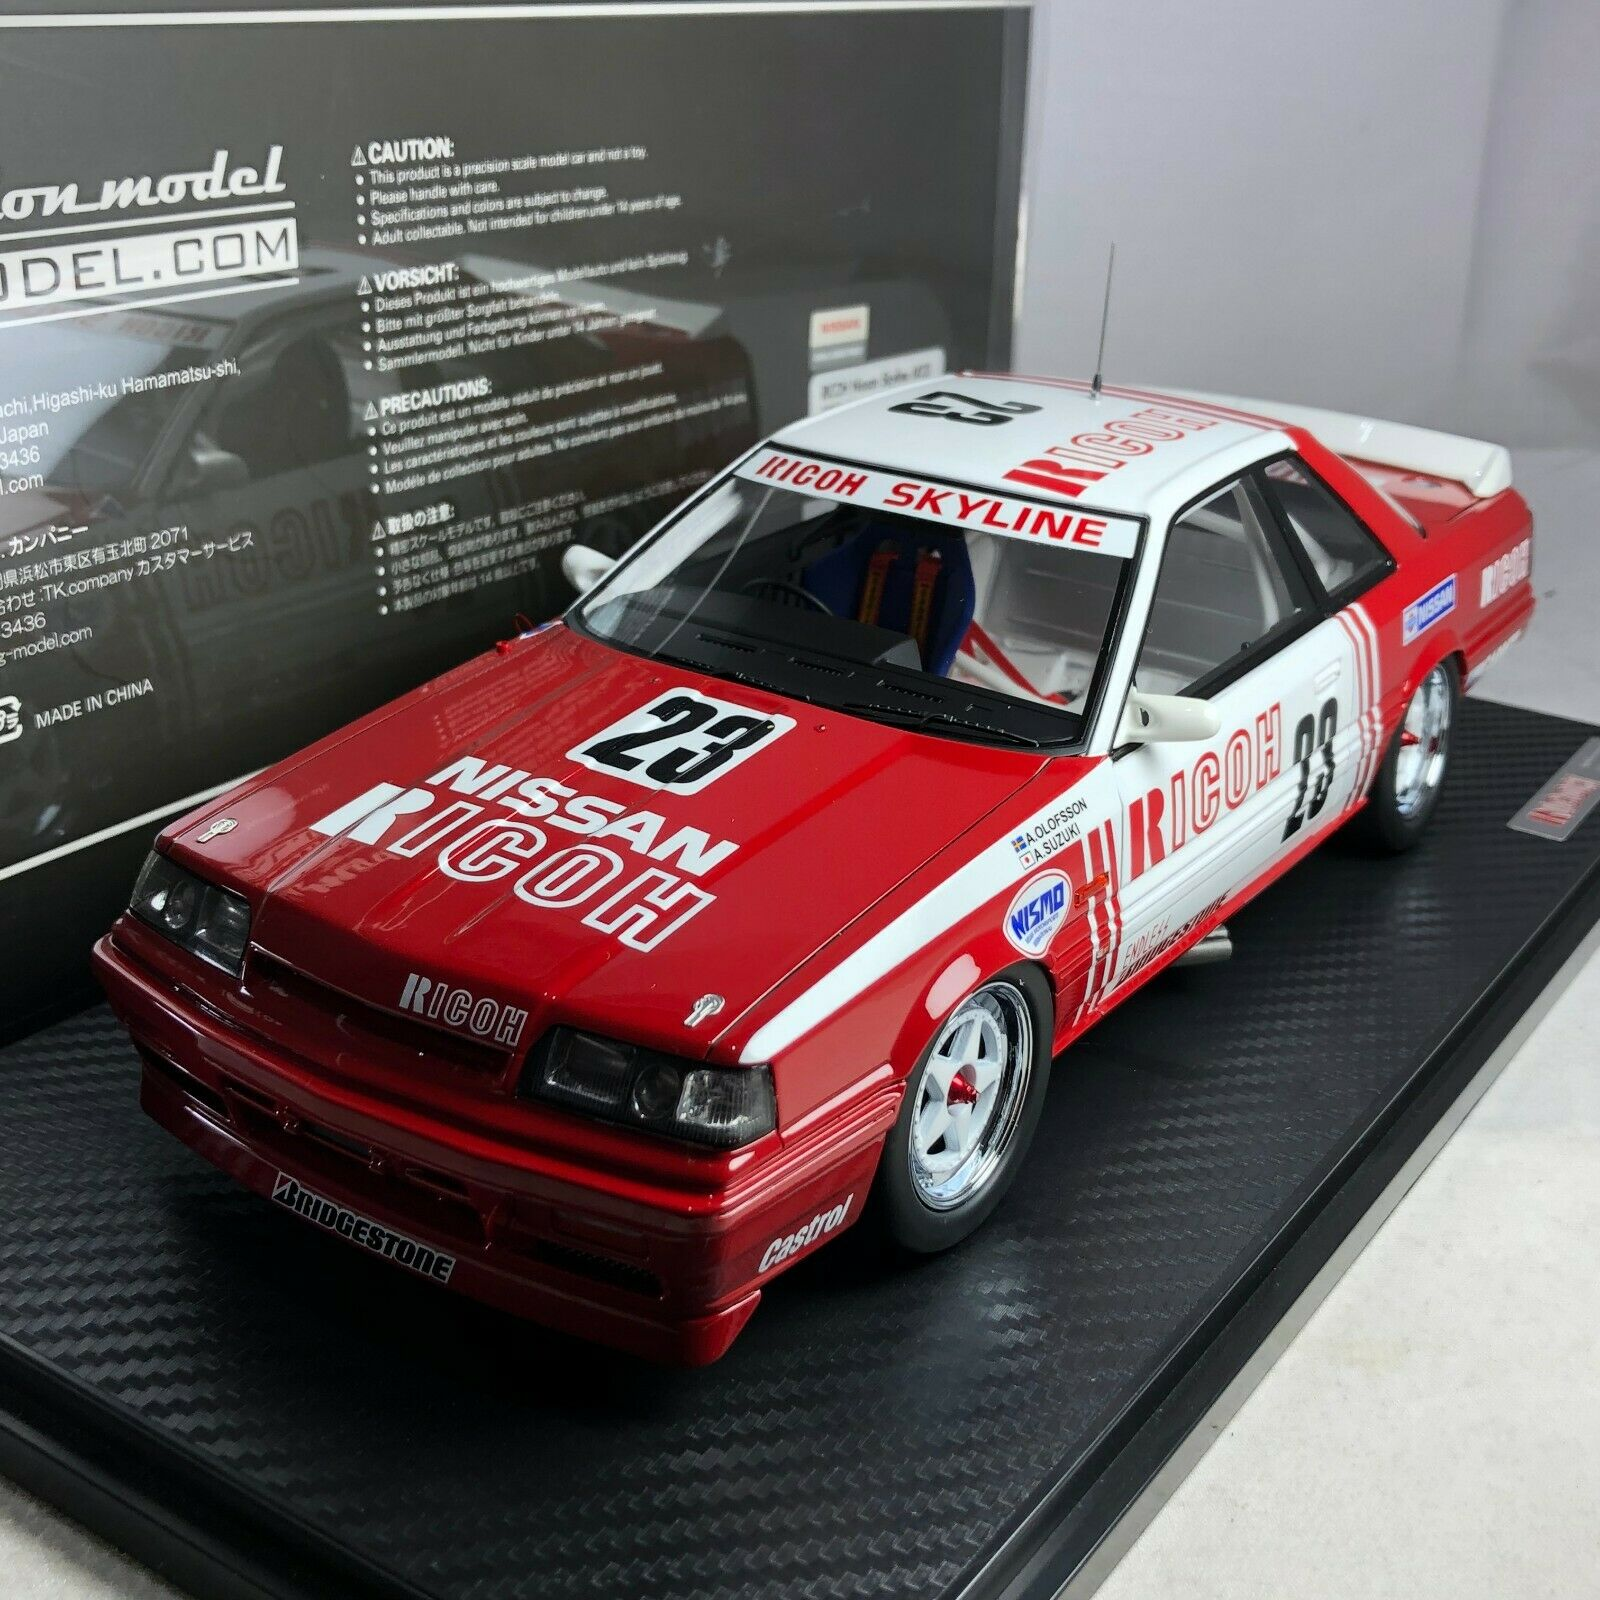 1 18 IG ignition  IG1726 RICOH Nissan Skyline () 1988 JTC